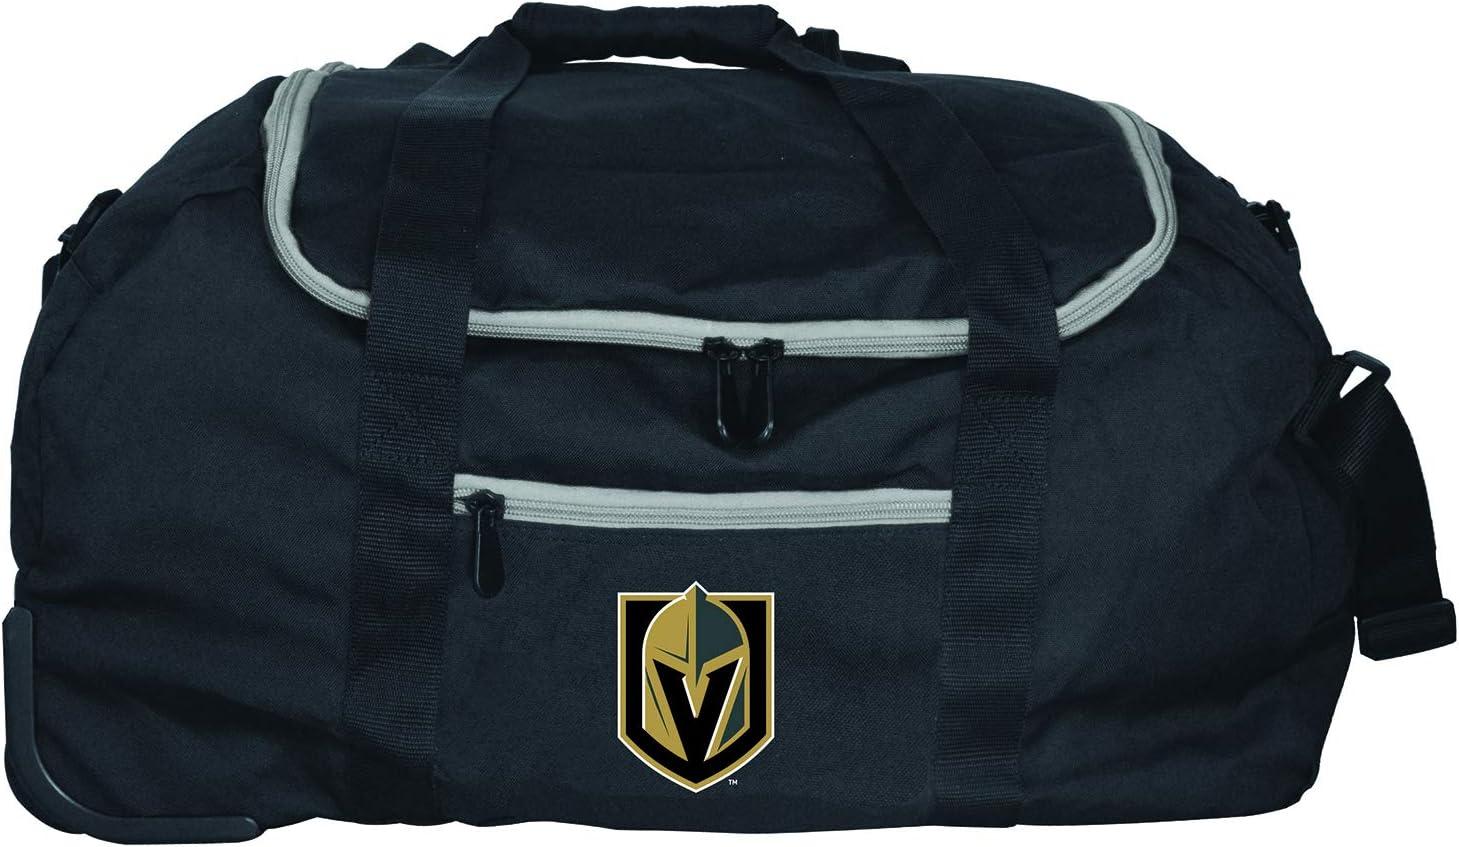 Denco NHL Vegas Golden Knights Collapsible Duffel 22 Black